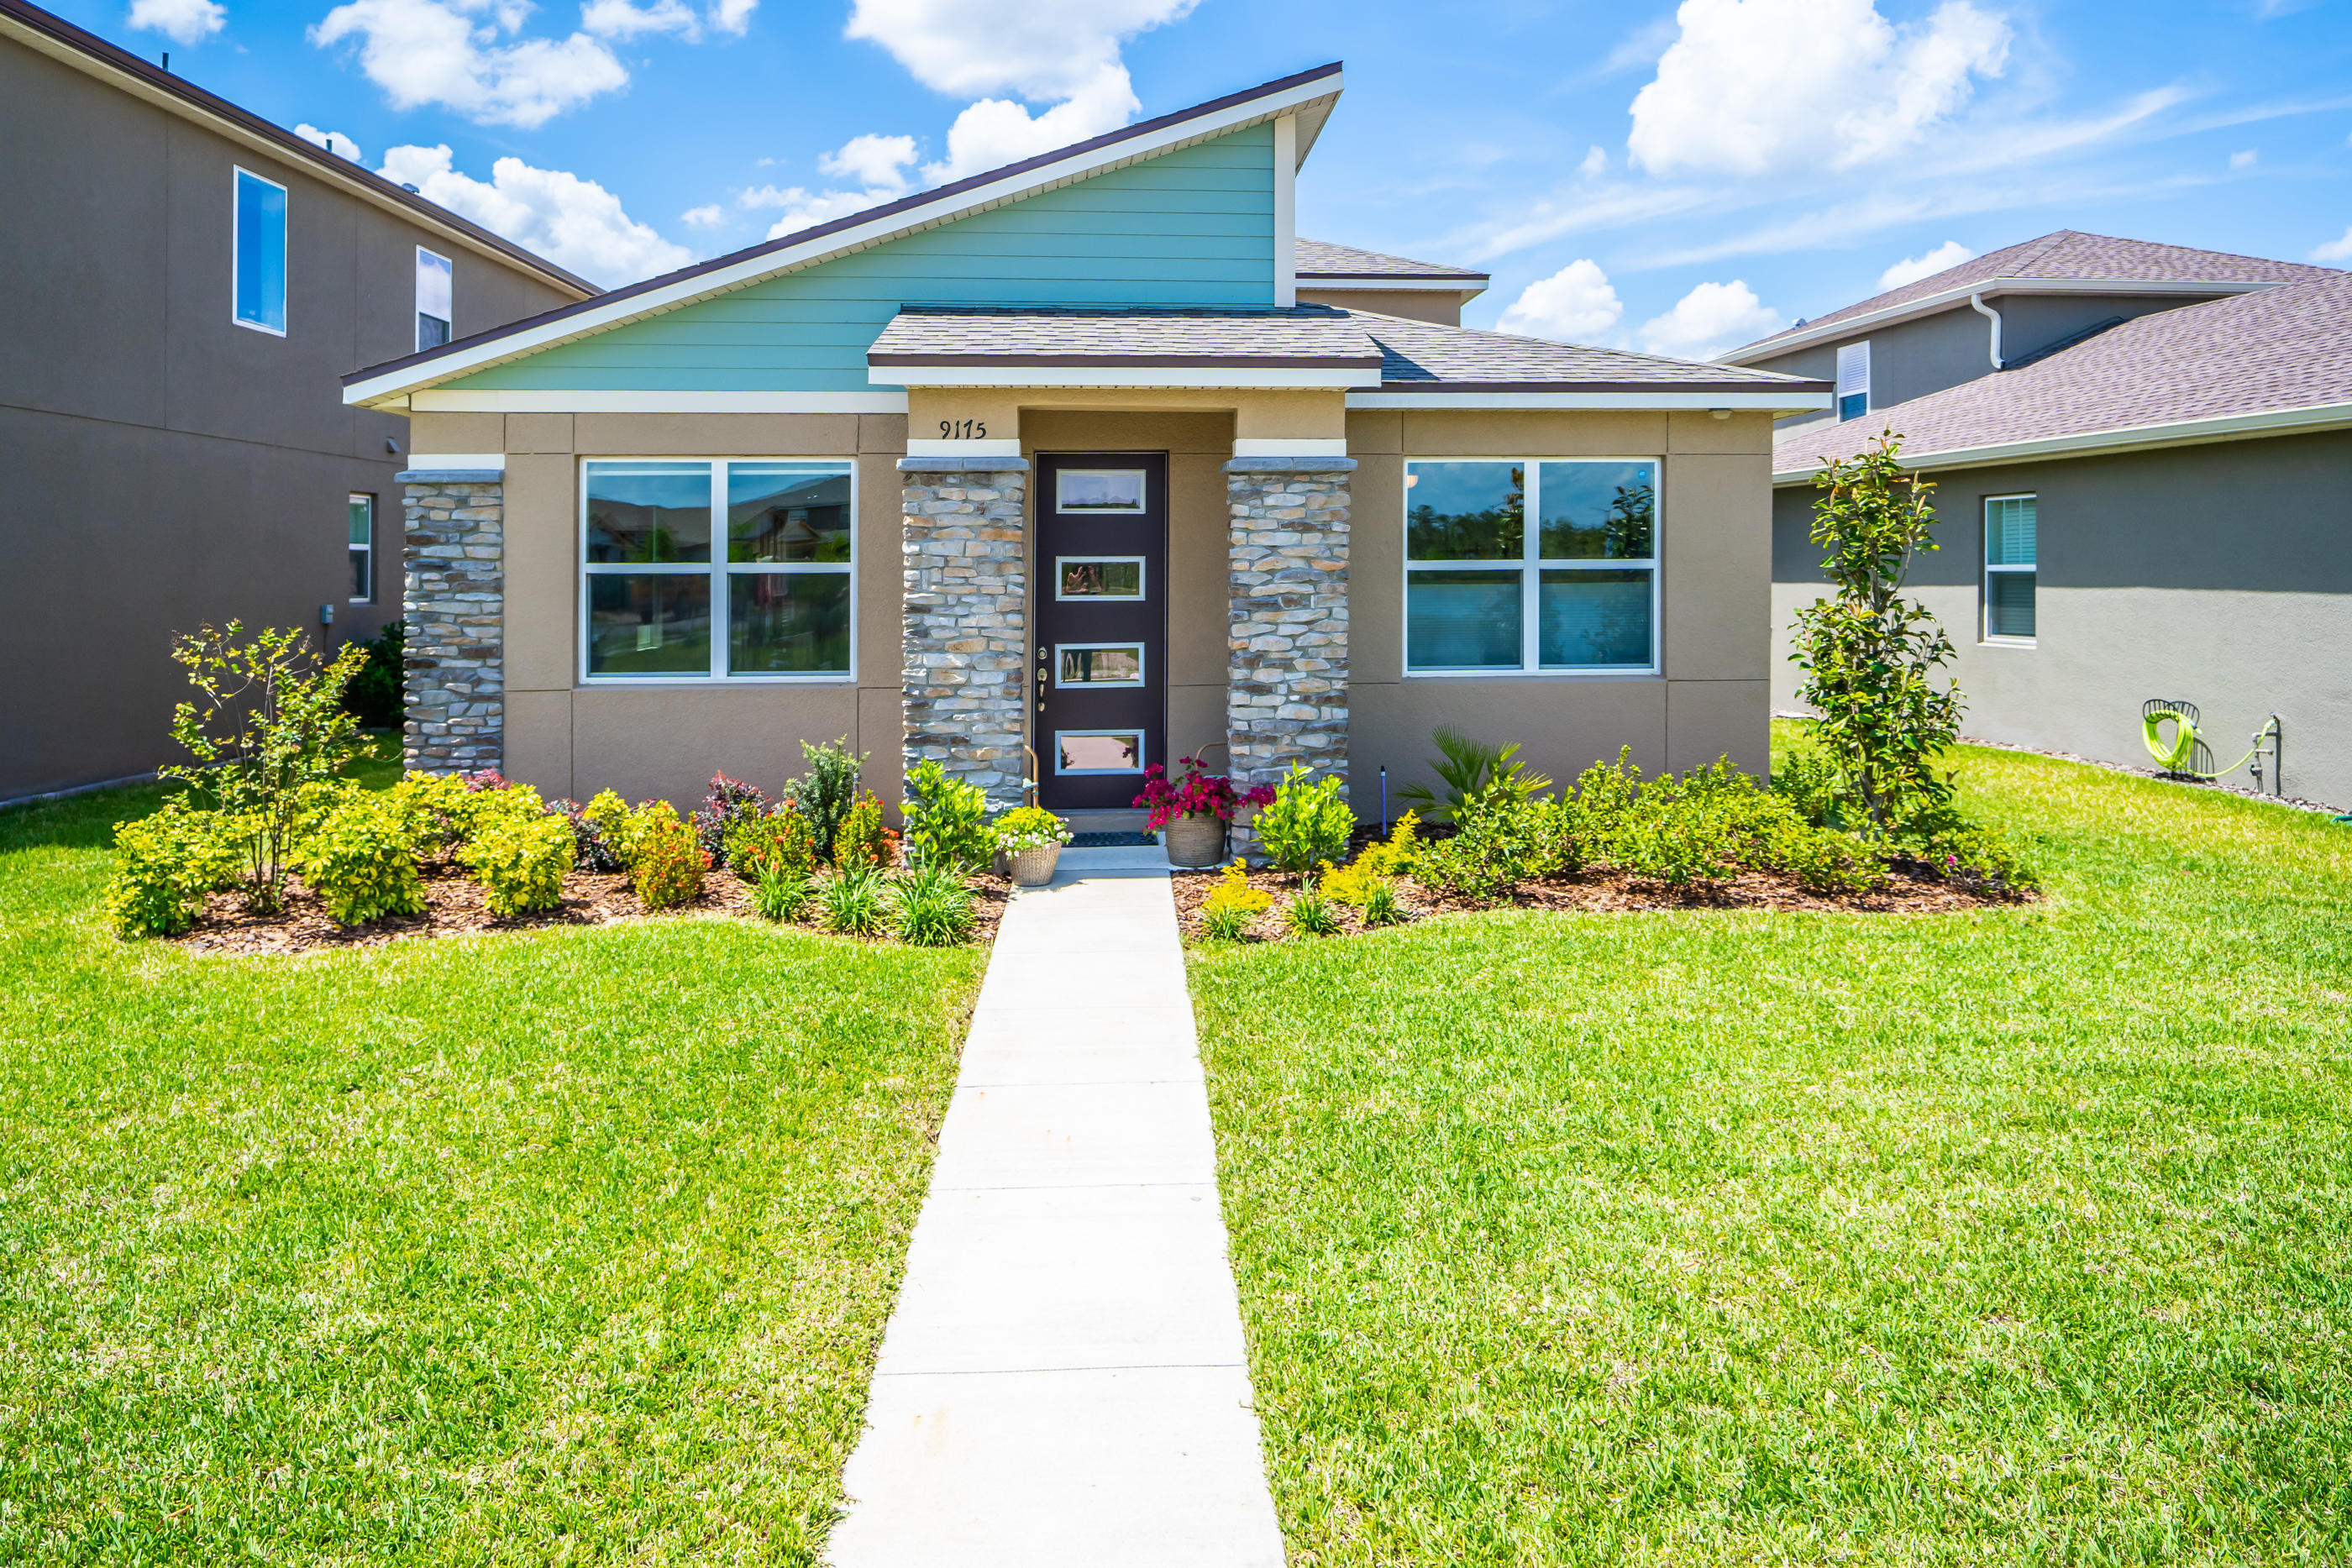 9175 Longship Alley, ORLANDO, Florida 32832, 3 Bedrooms Bedrooms, ,3 BathroomsBathrooms,Single Family,For Sale,9175 Longship Alley,2,1083467